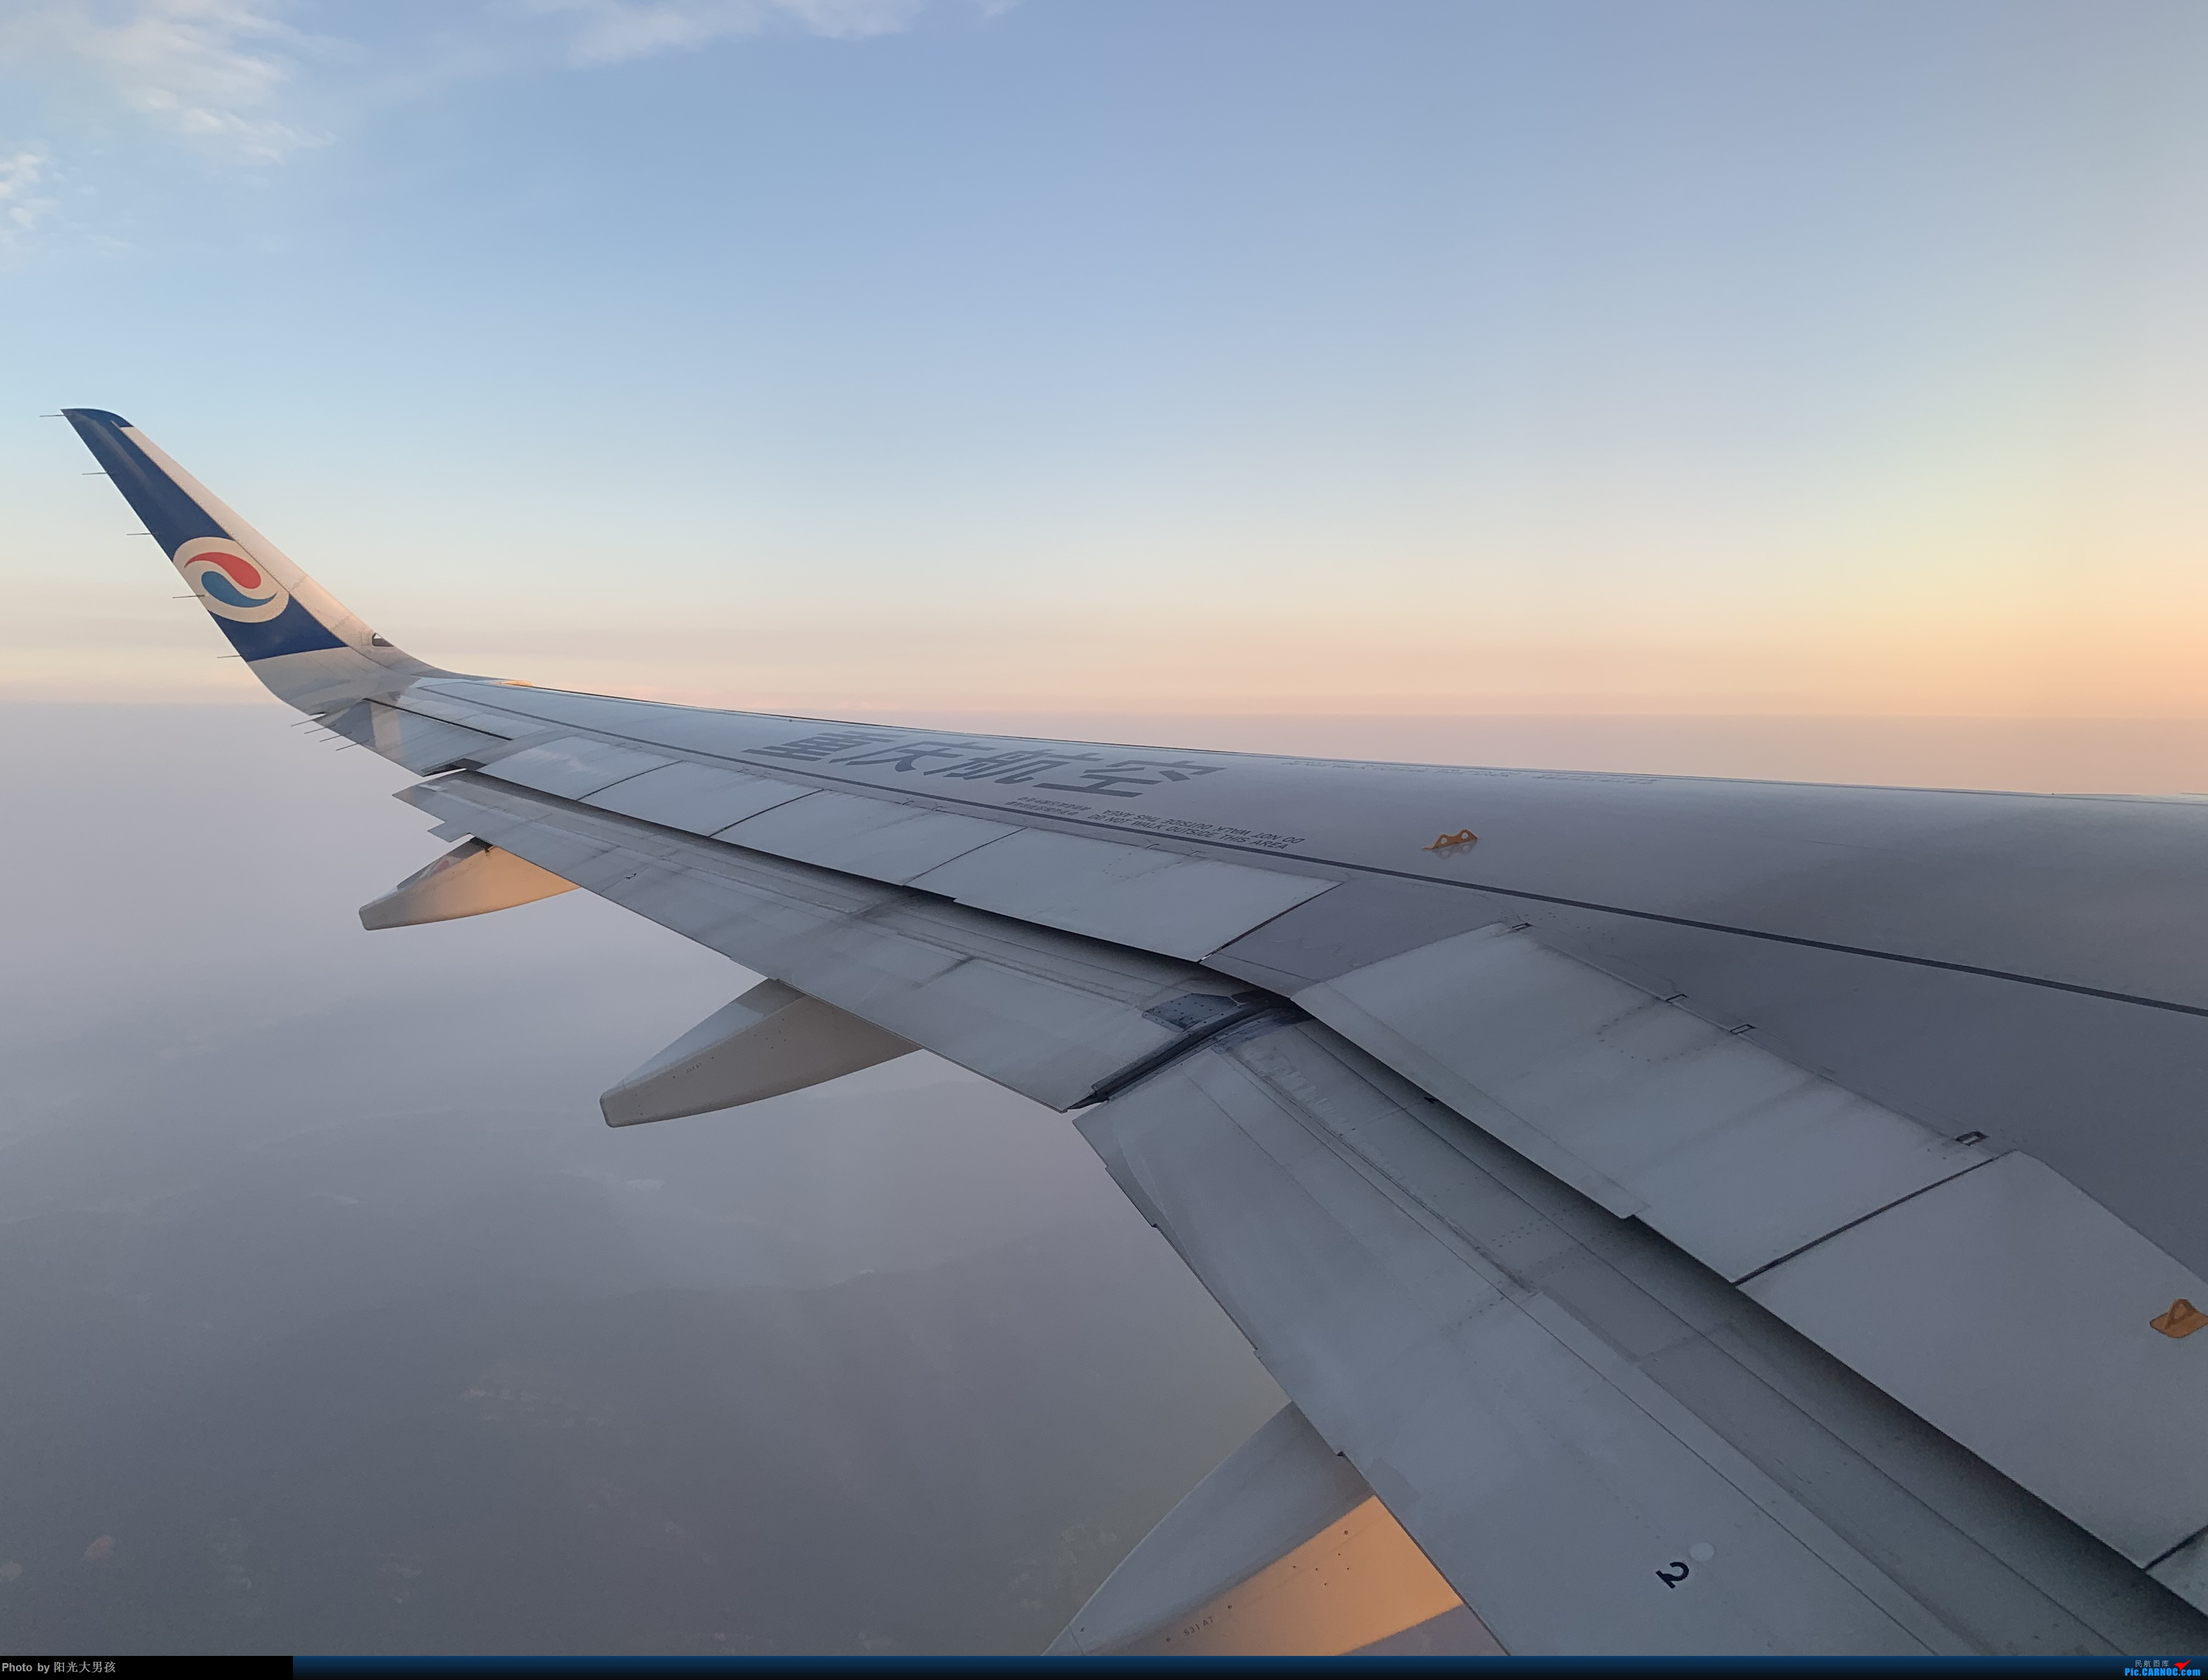 Re:[原创]继续讲述游记内容,第一次发有点不熟练,还请包涵一下 AIRBUS A320NEO B-307S 机上(57A)